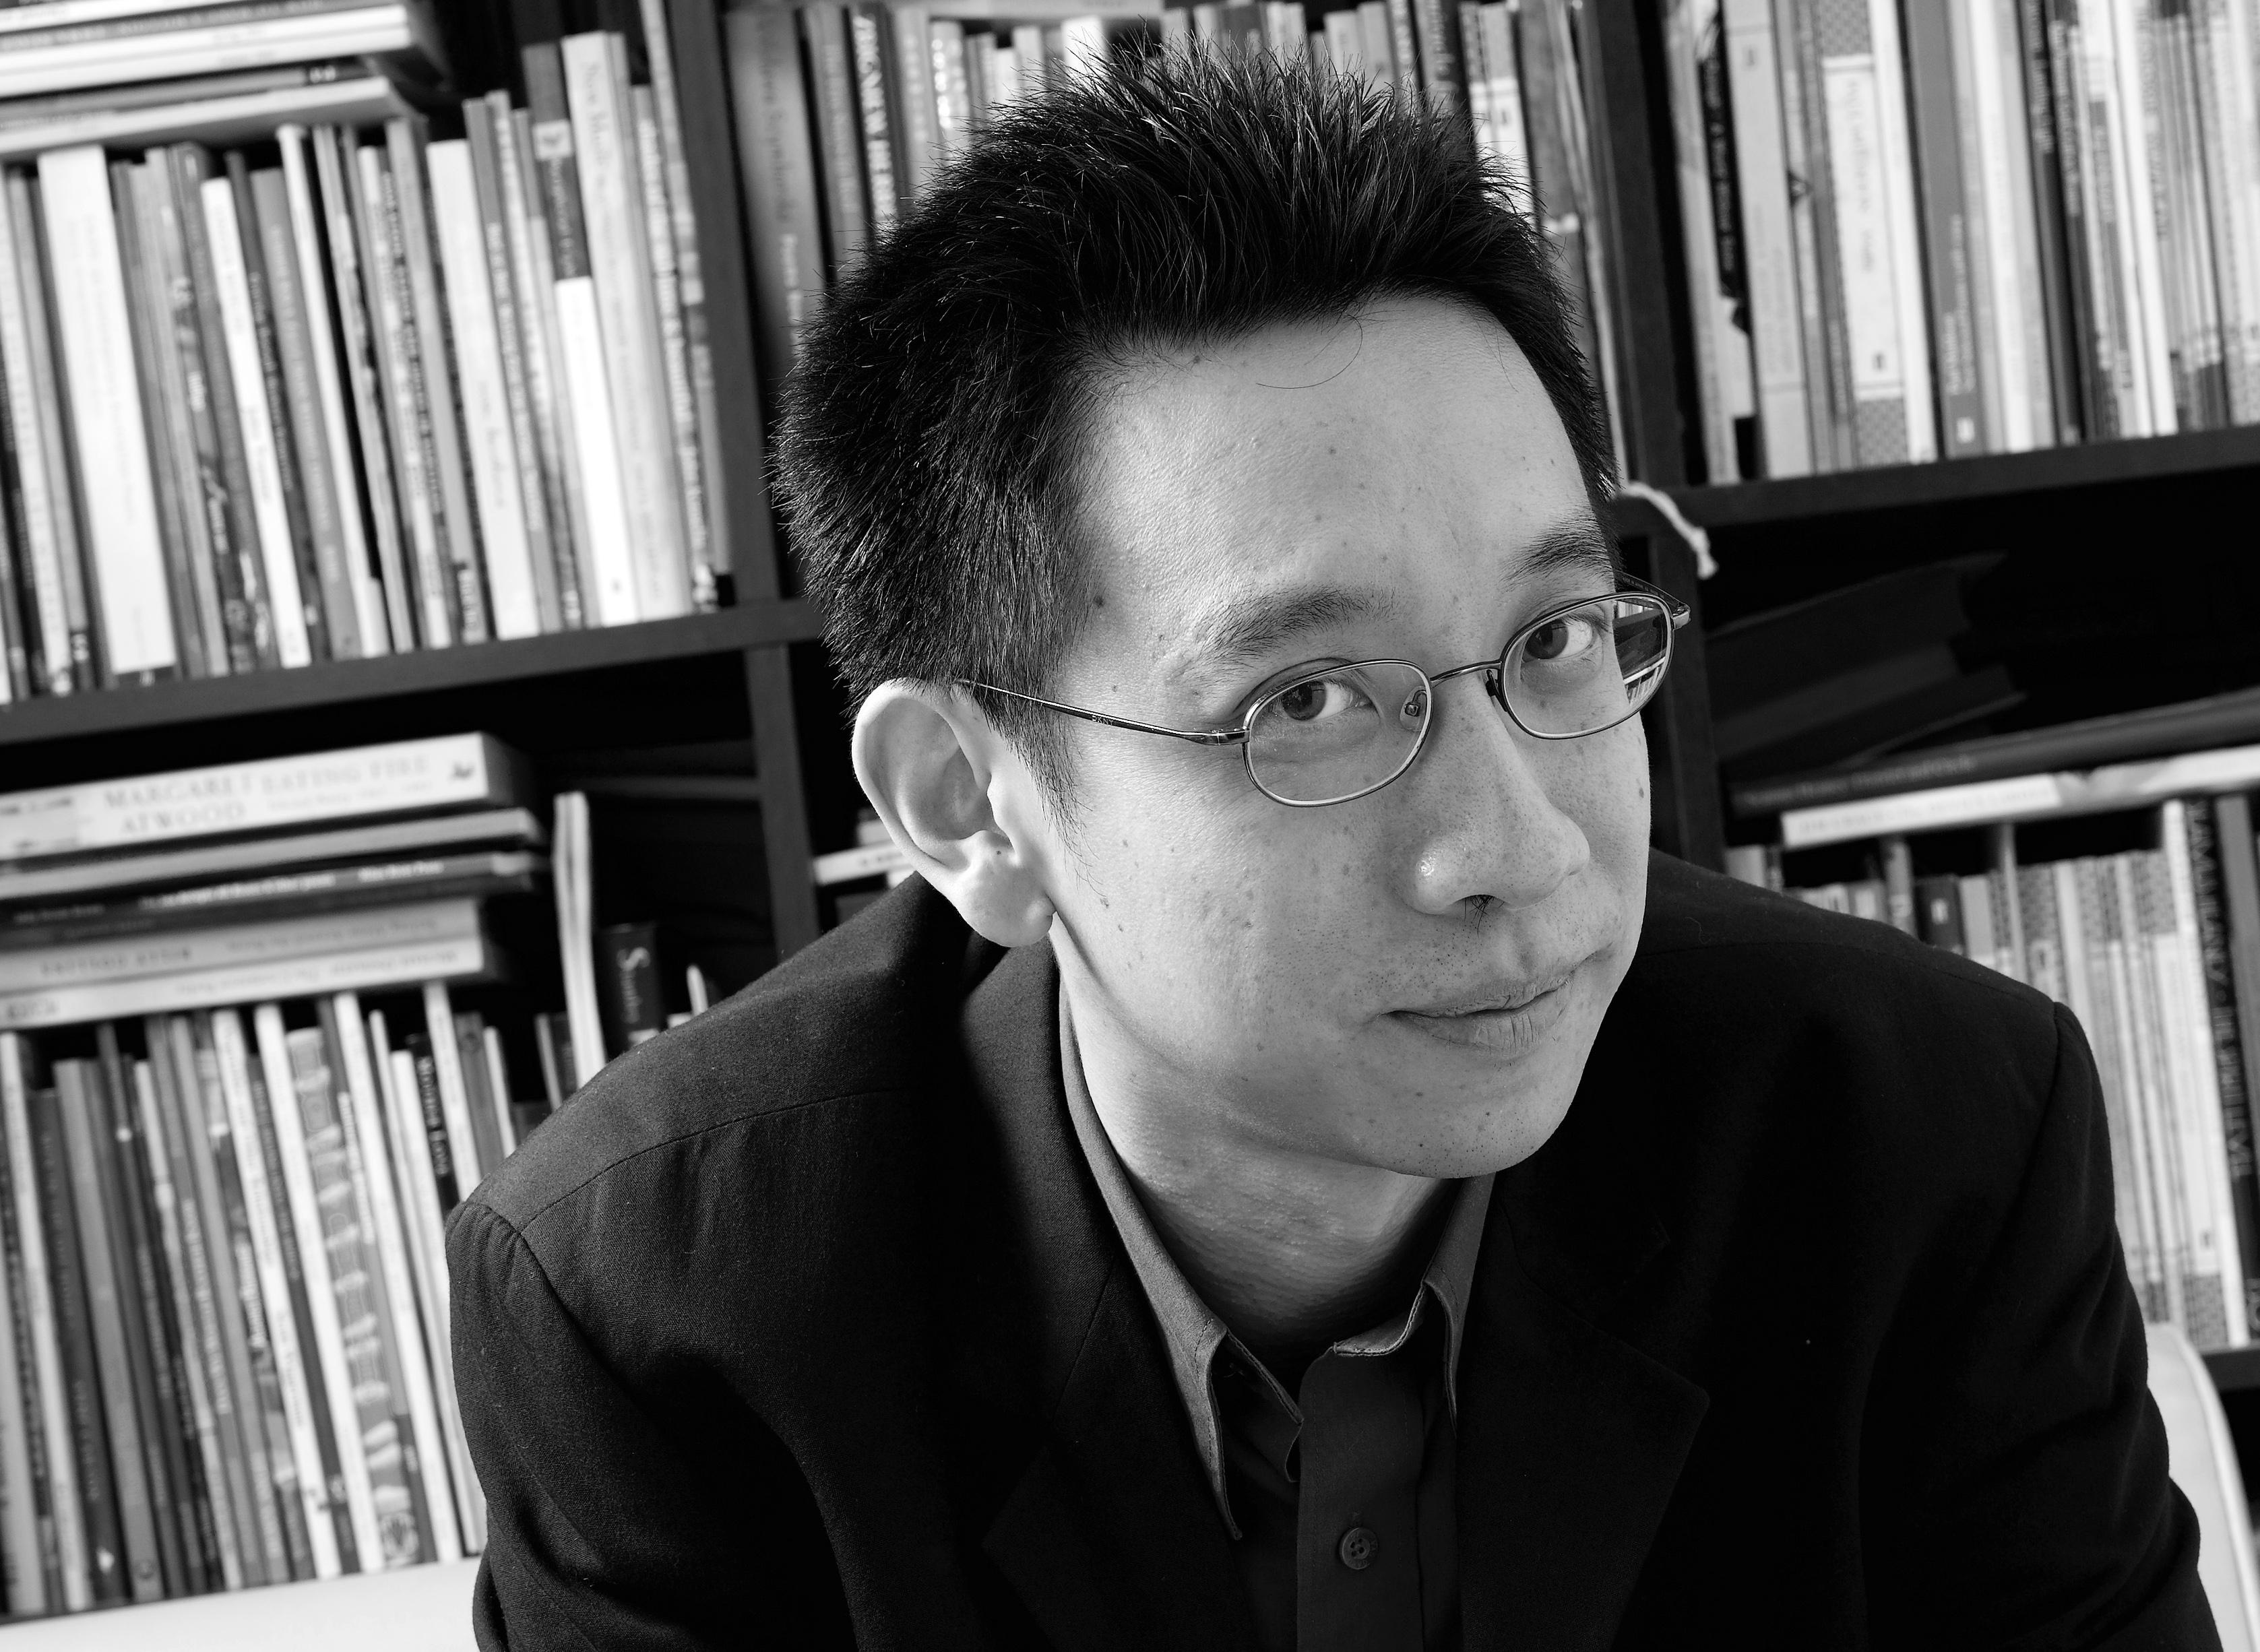 Alvin-Pang_RAMUS2015